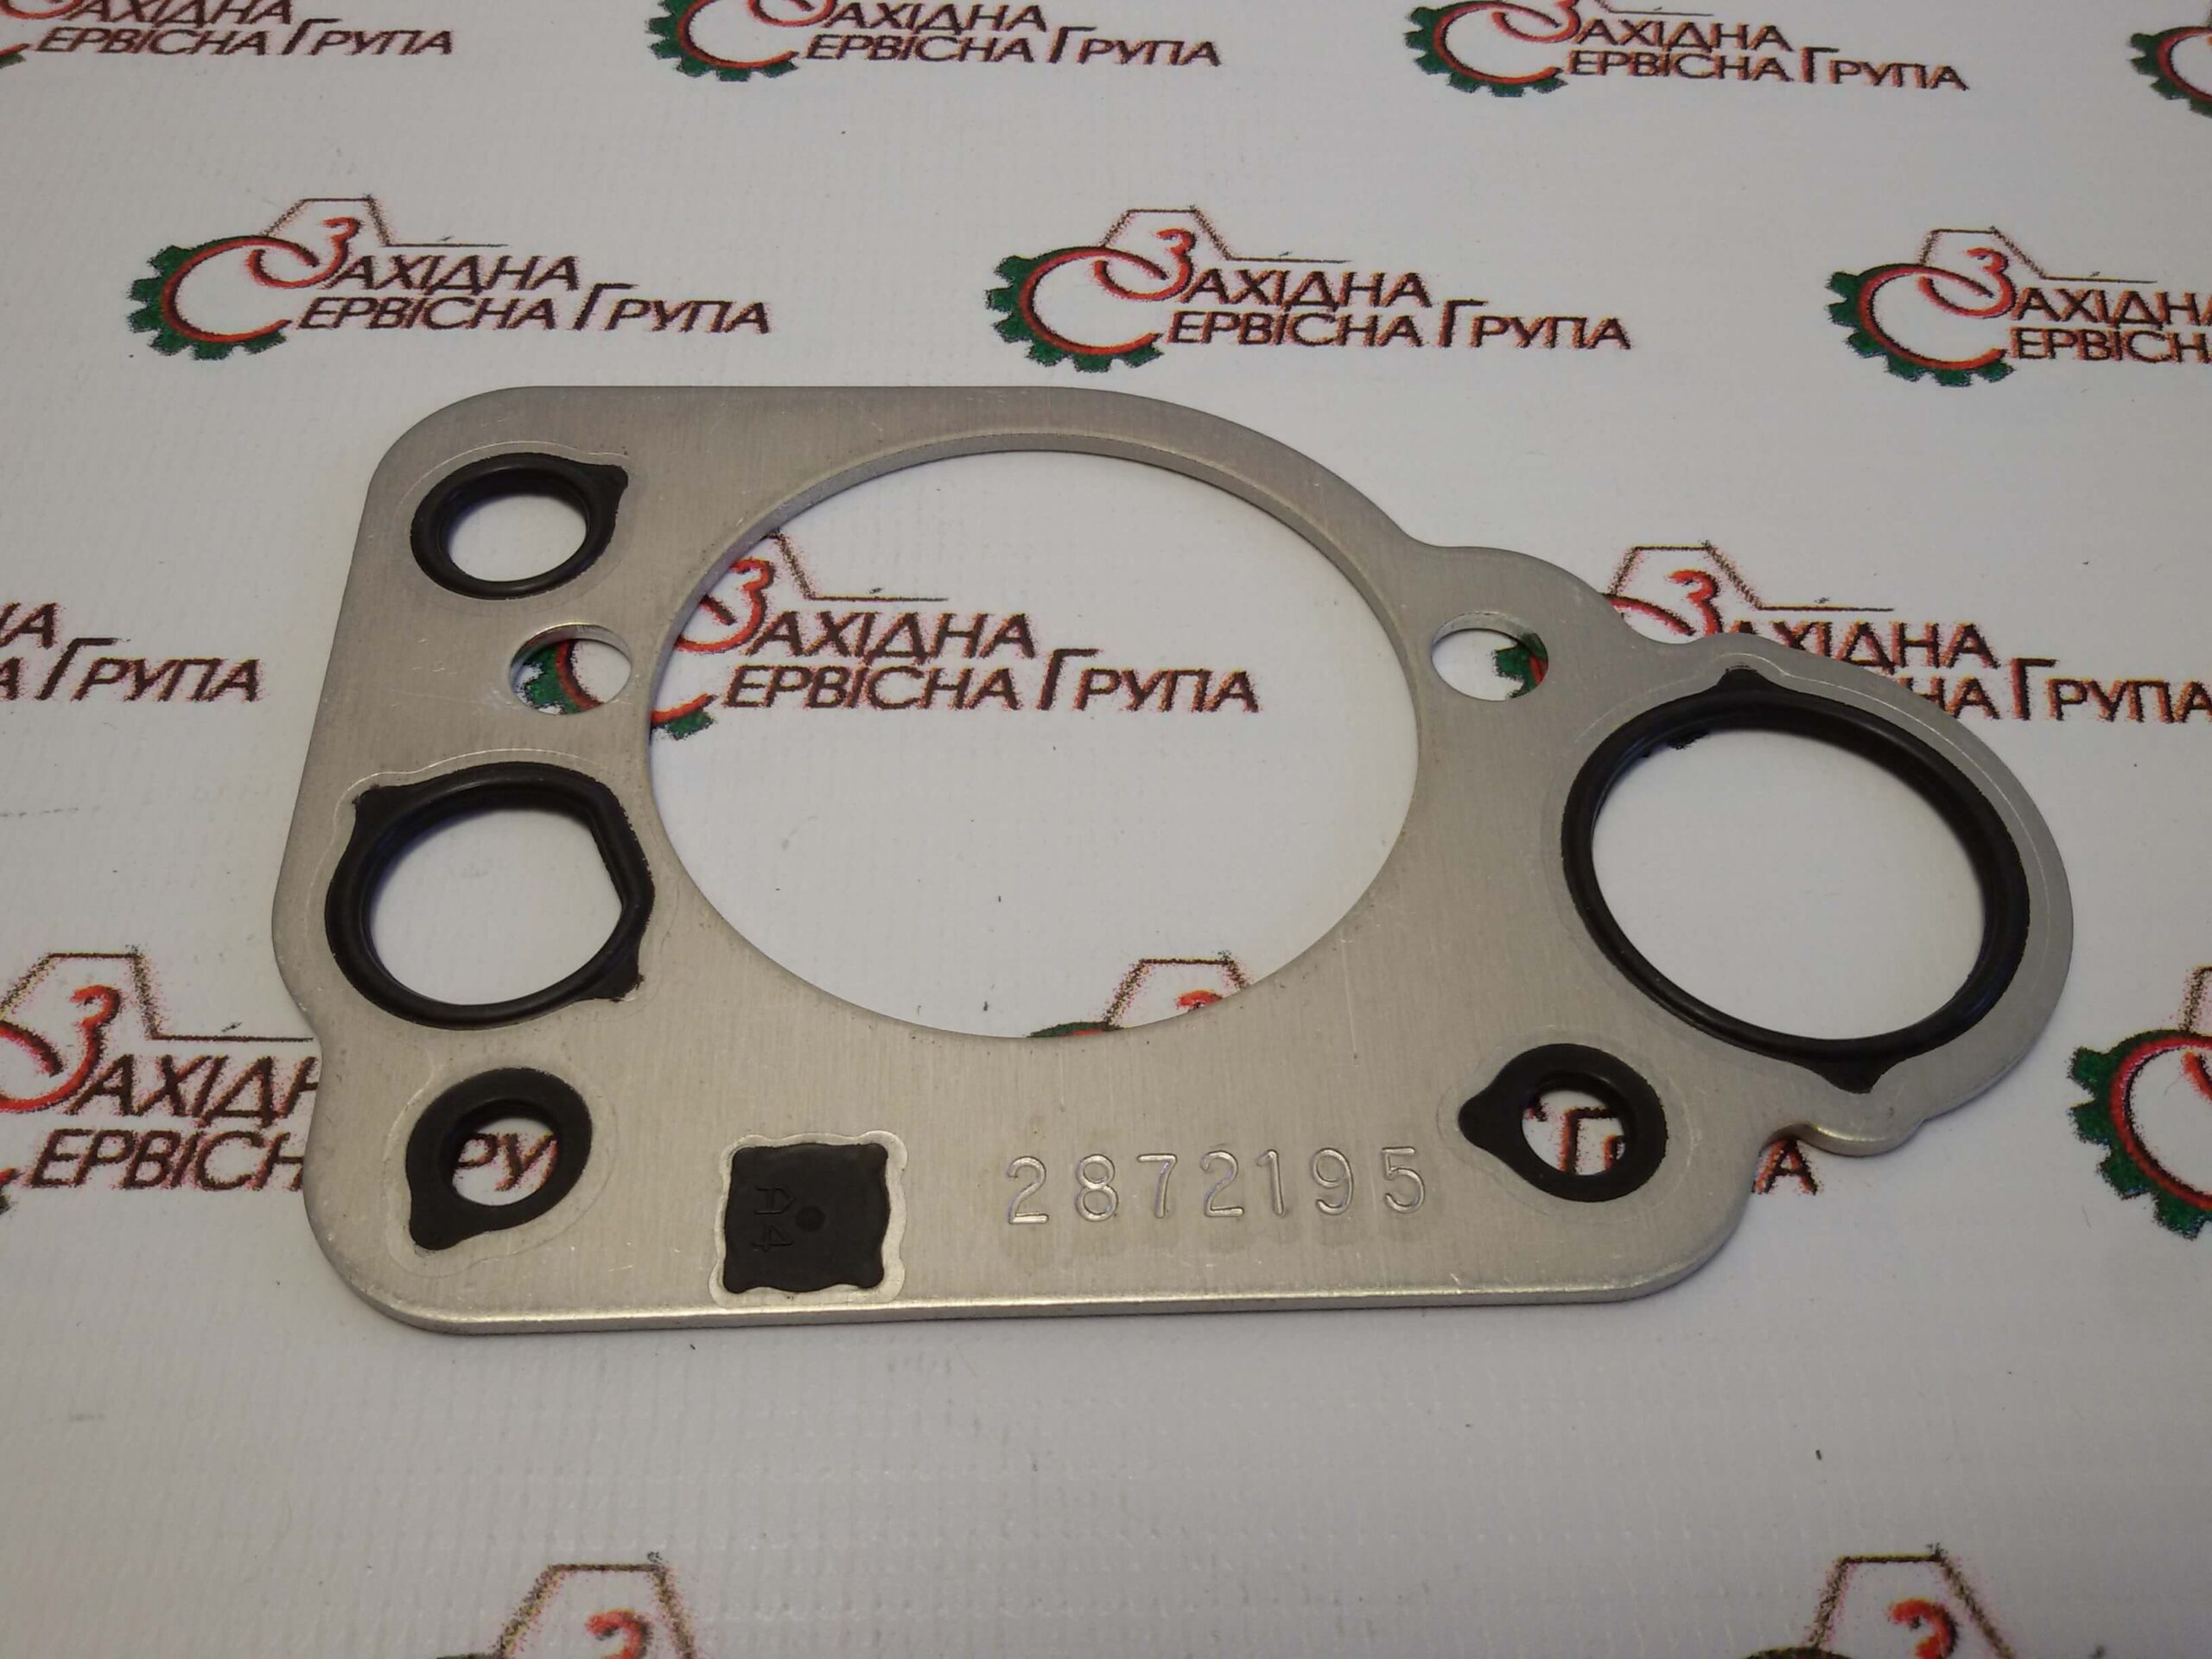 Прокладка паливного насоса Cummins ISX15, QSX15, 2872195, 4954472, 4062005.